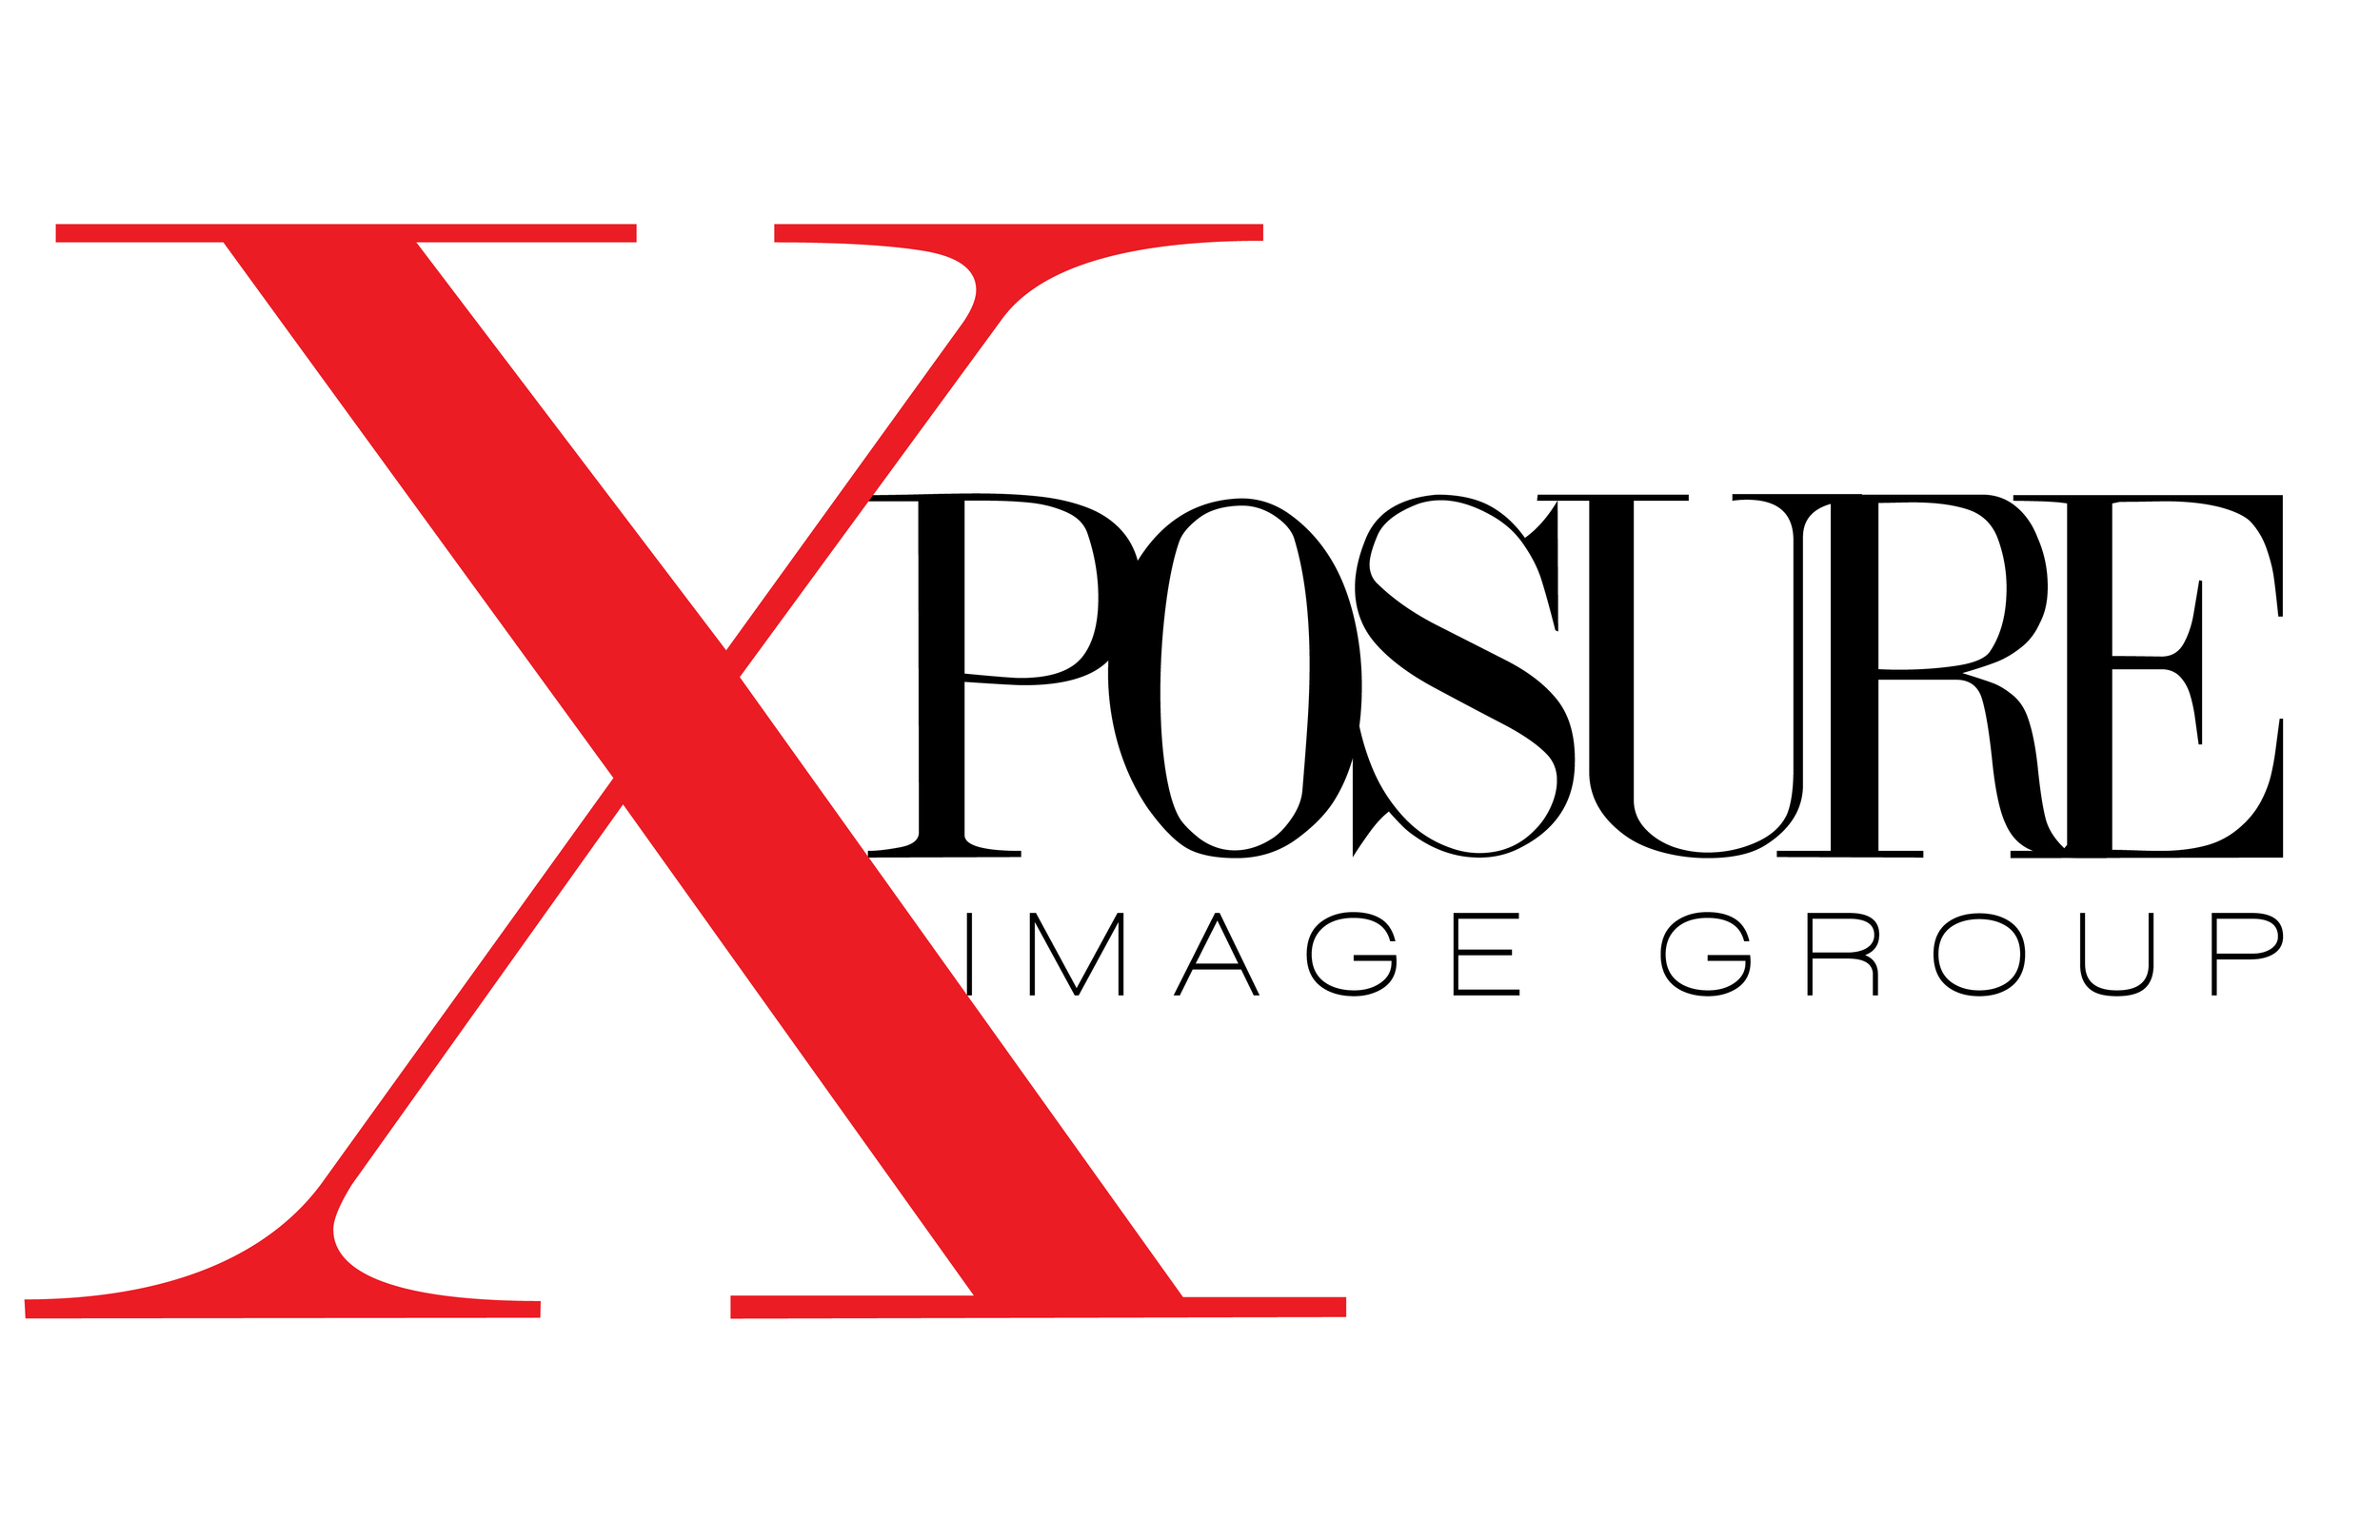 XPOSURE LOGO-FINALMAIN LOGO RED BLACK-01.jpg